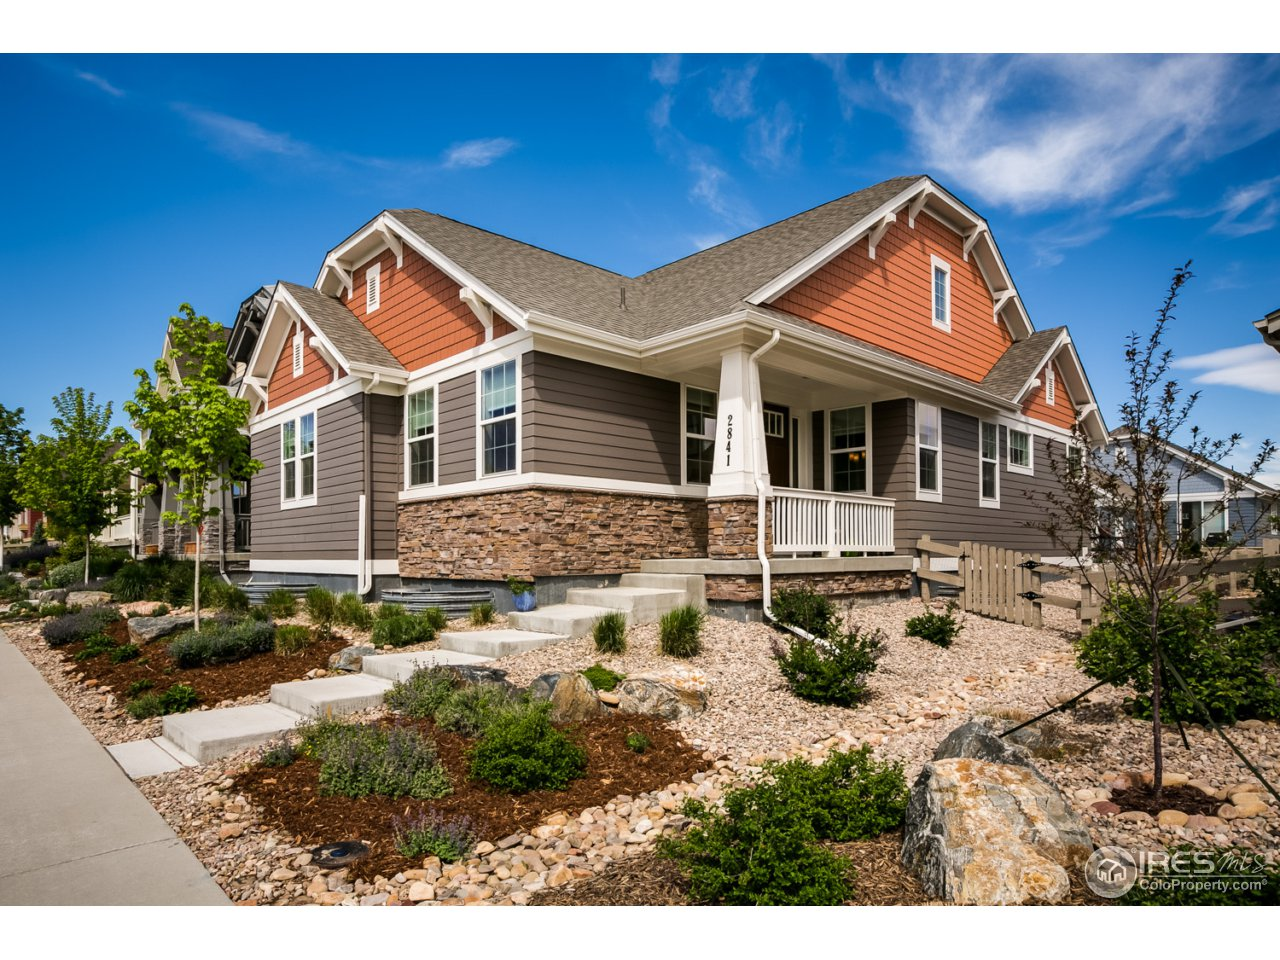 2841 Cascade Creek Dr, Lafayette CO 80026